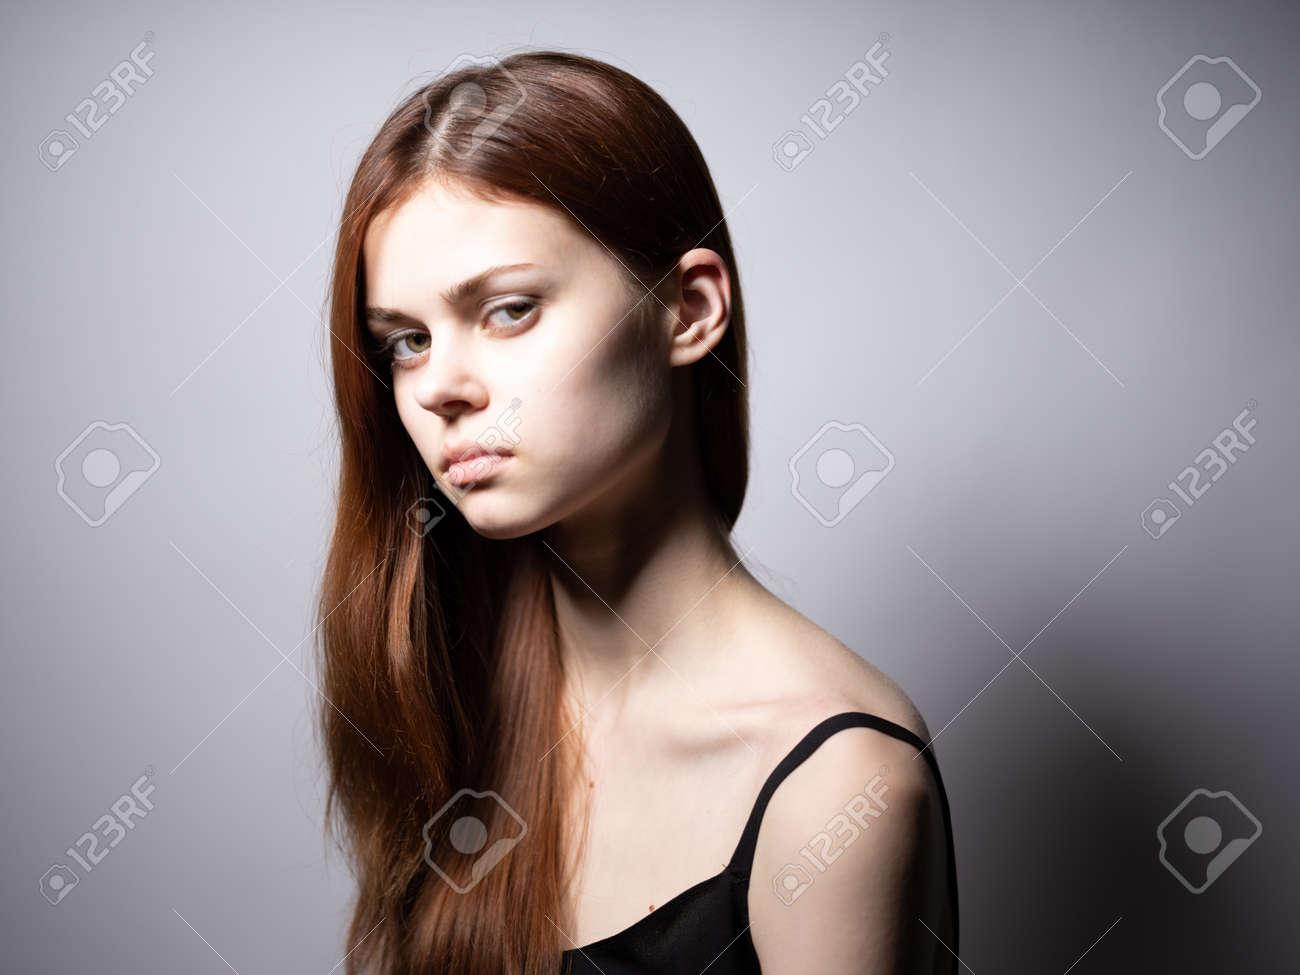 elegant lady in black t-shirt red hair sad face - 165322614